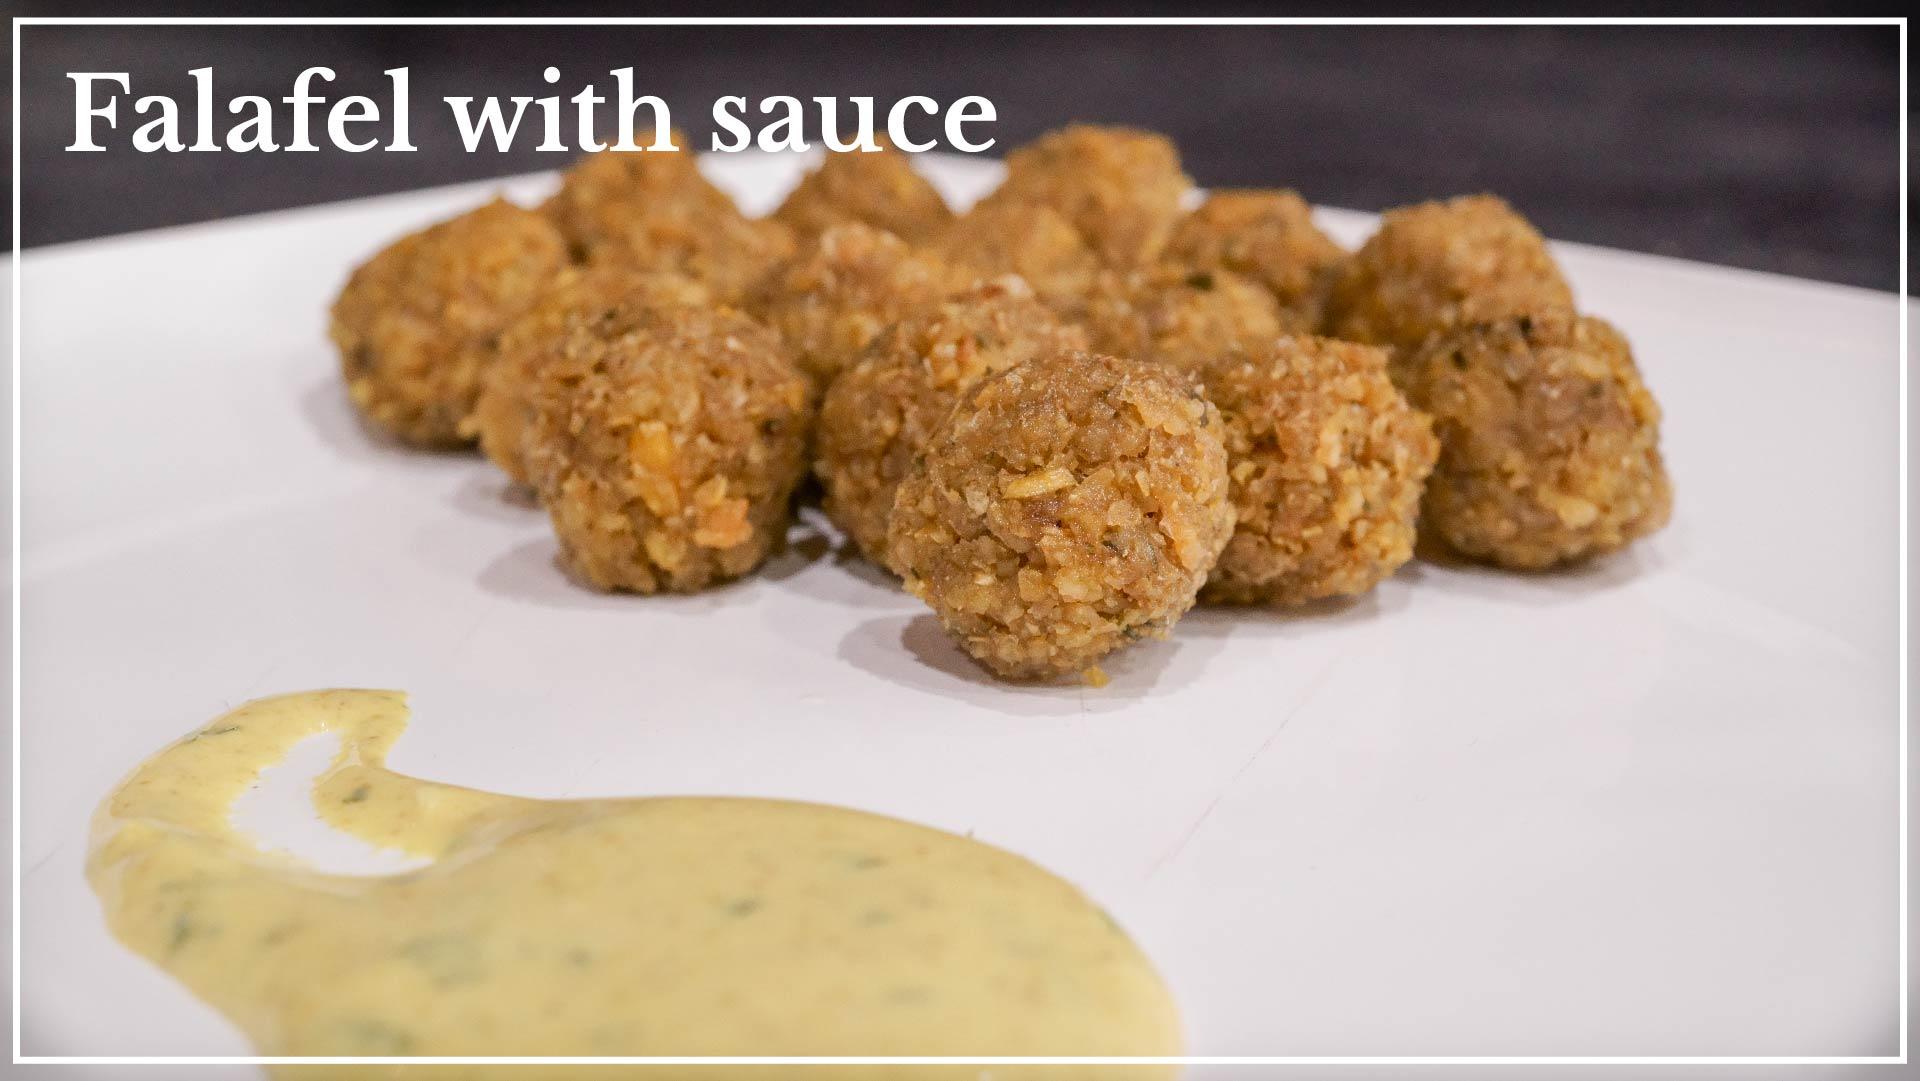 Falafel with sauce - based on chickpea paste with yogurt sauce or tahini sauce, based on sesame